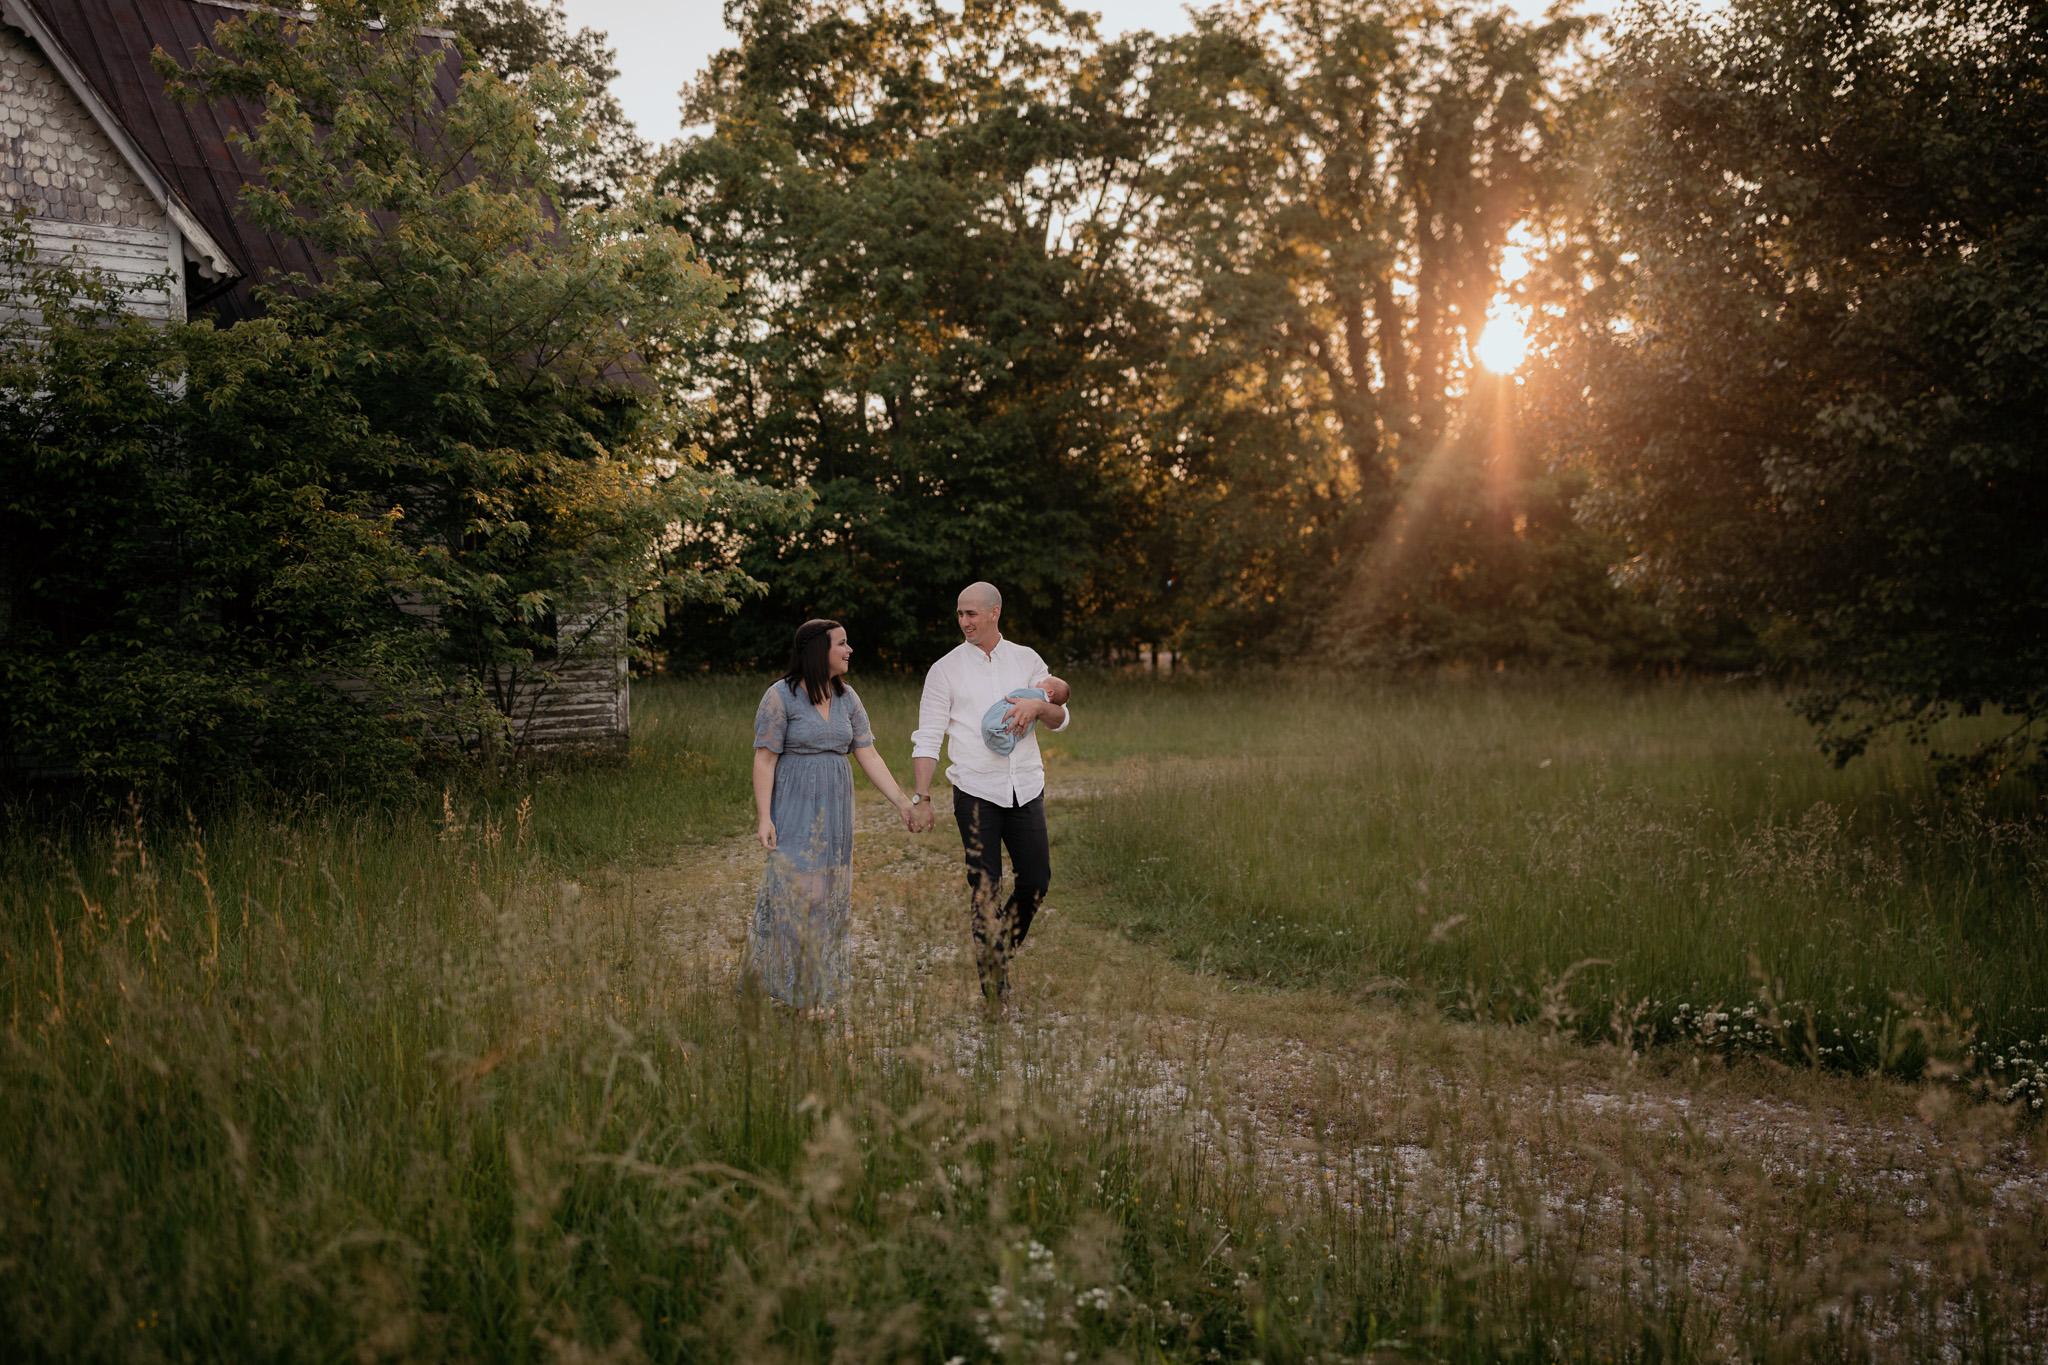 couple walking with newborn